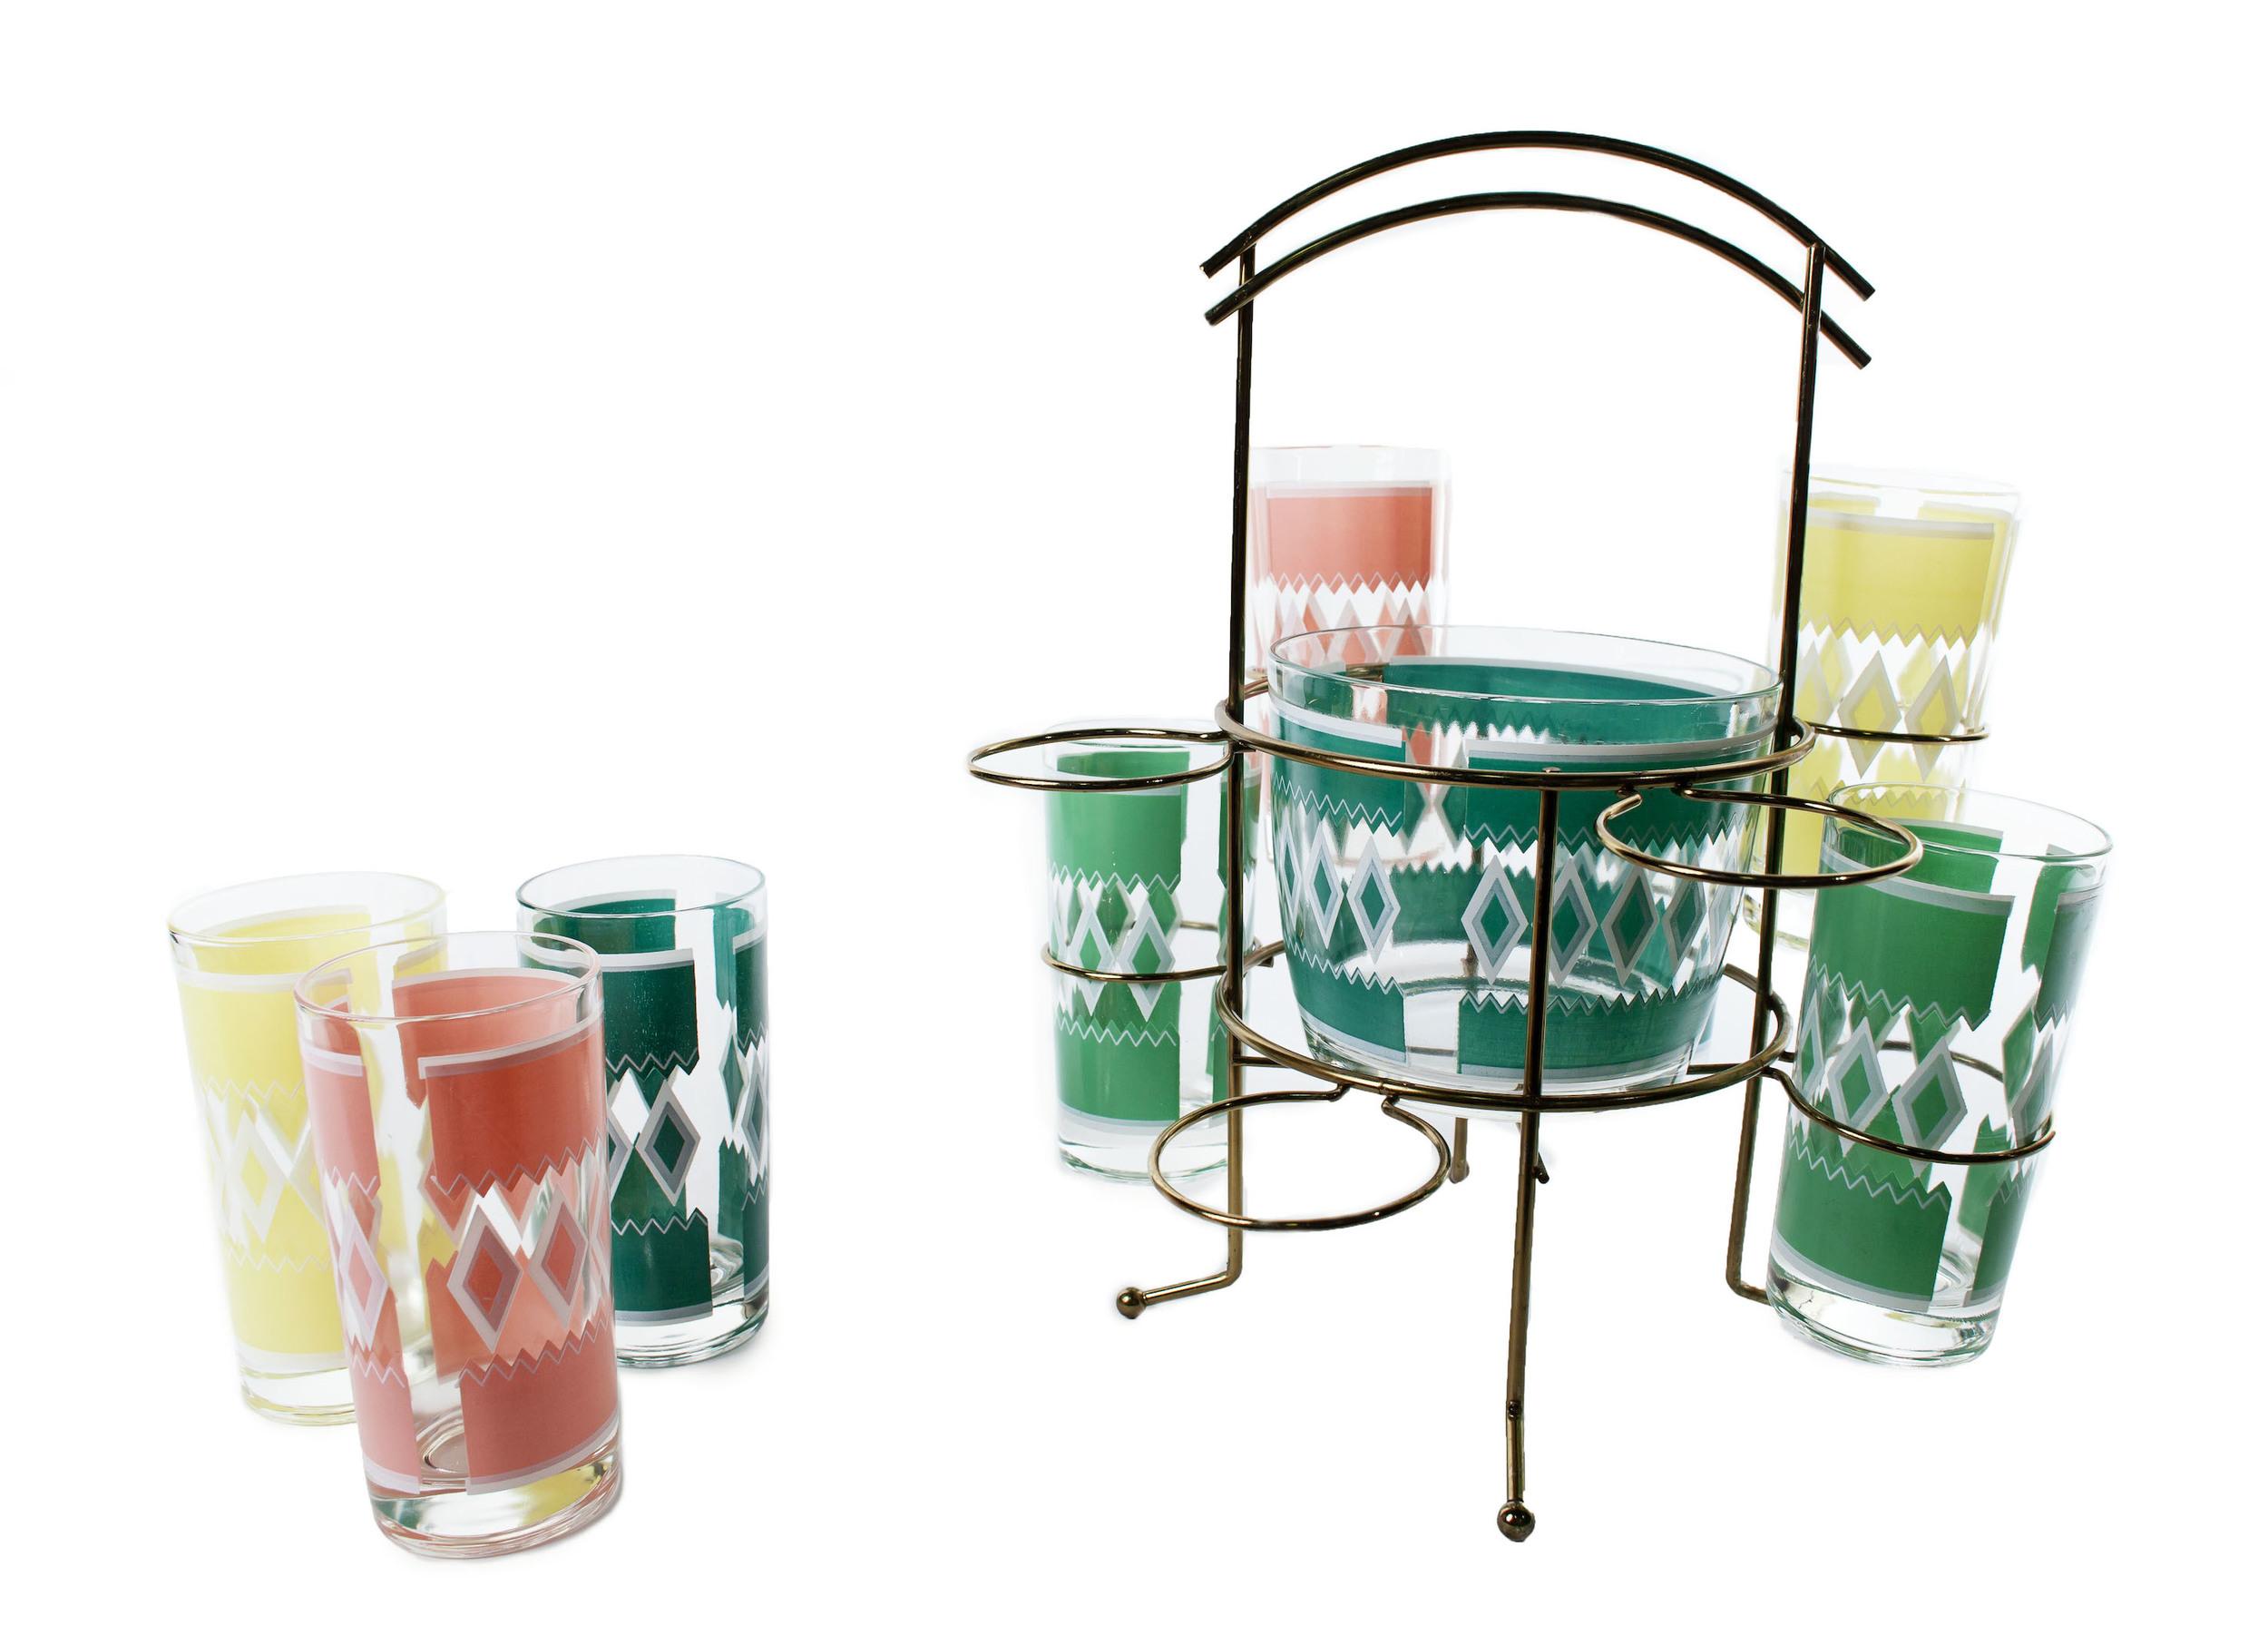 1960s glass set with ice bucket